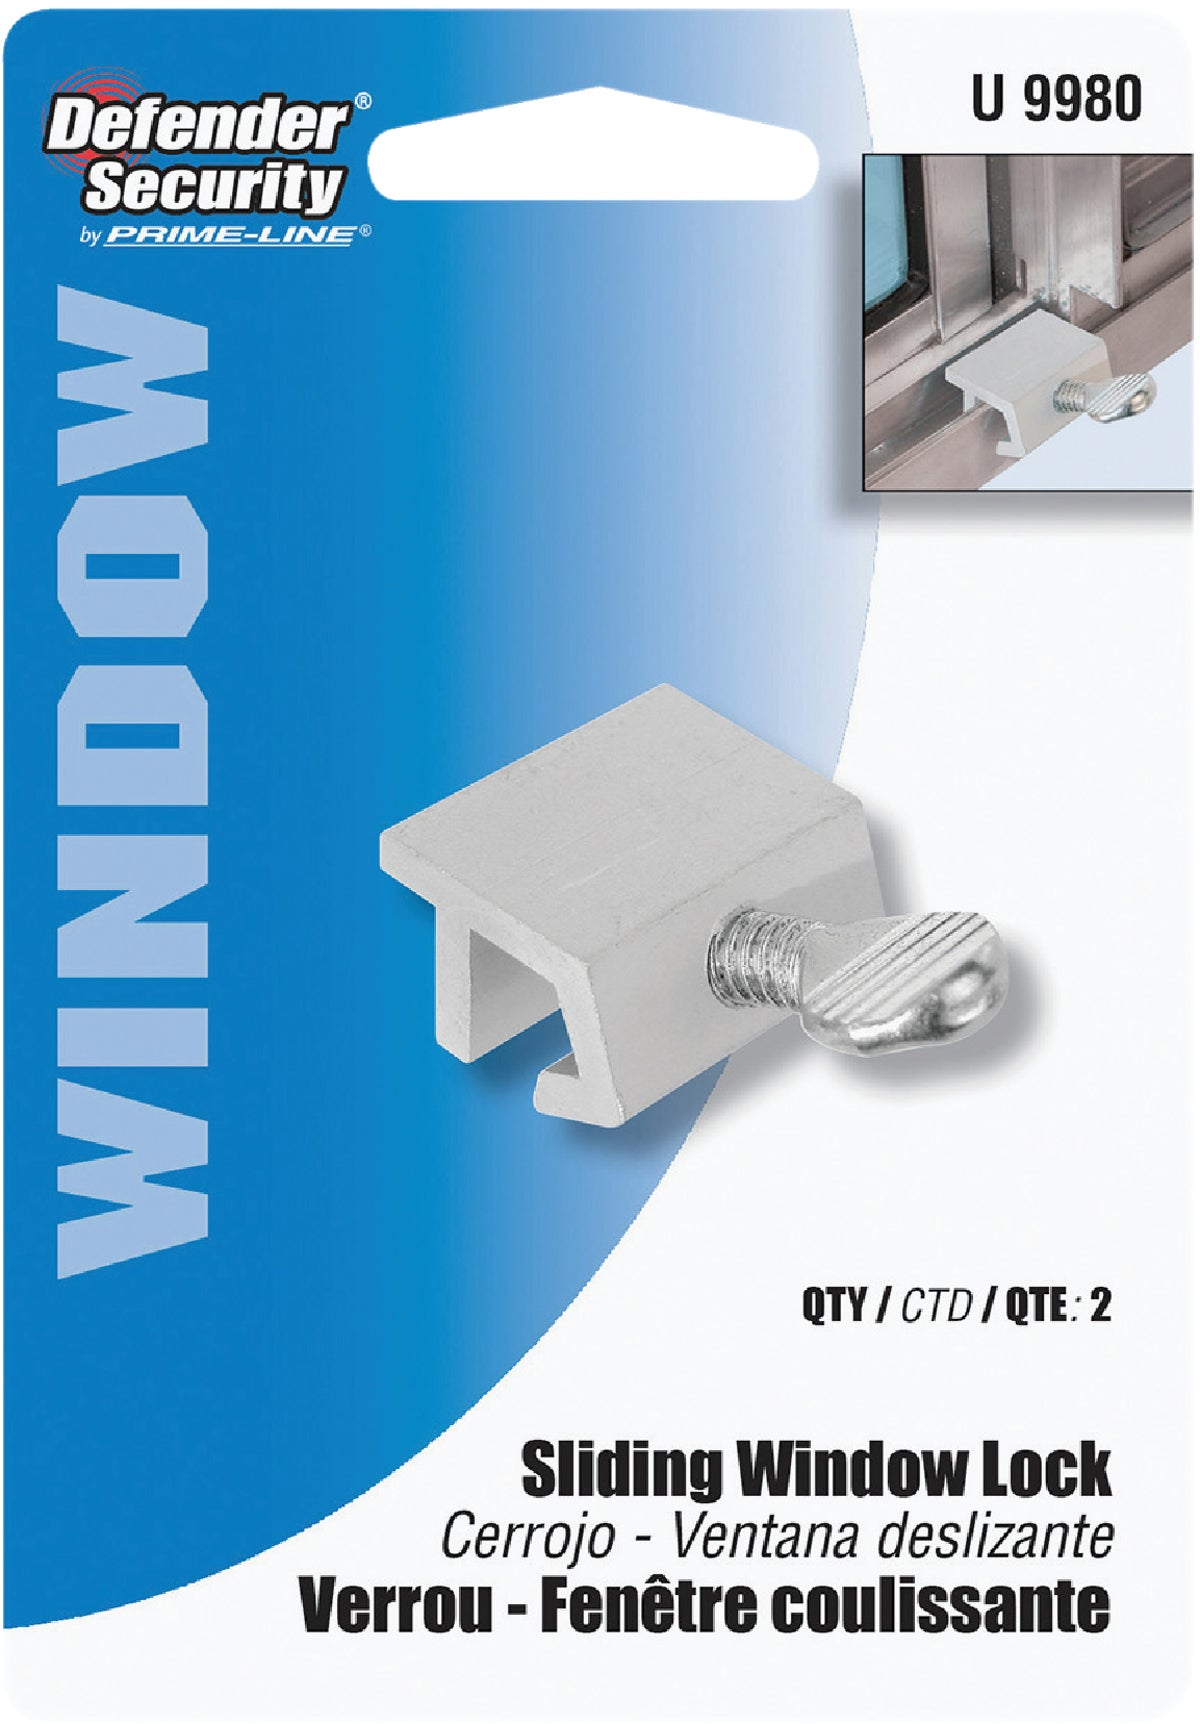 Buy Defender Security Heavy-Duty Sliding Window Lock Aluminum